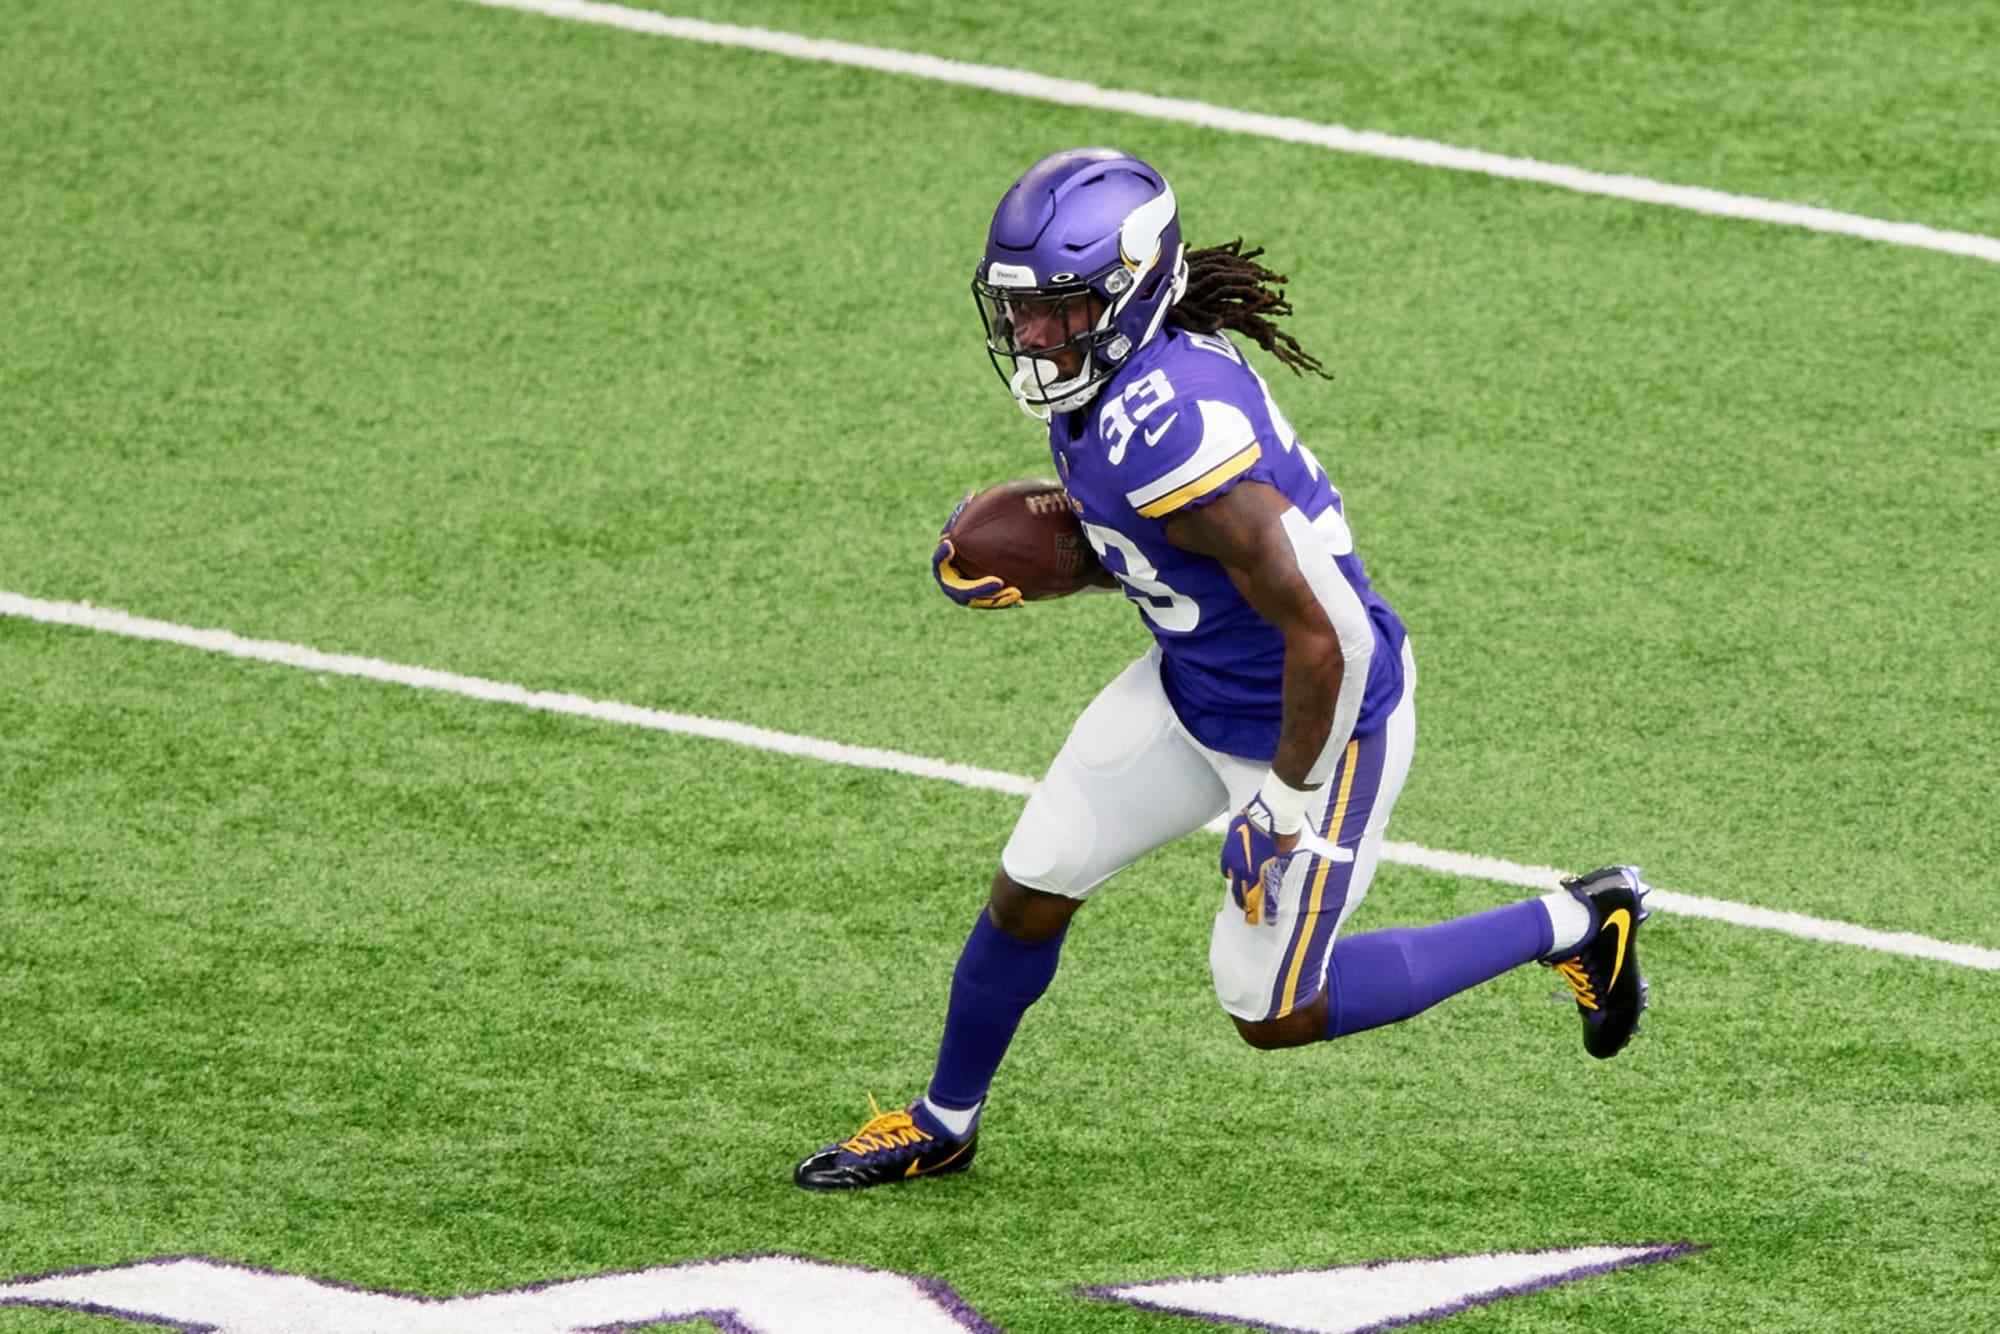 NFL Week 13 Fantasy RB's POV: Start Kamara, Cook; Sit Elliott